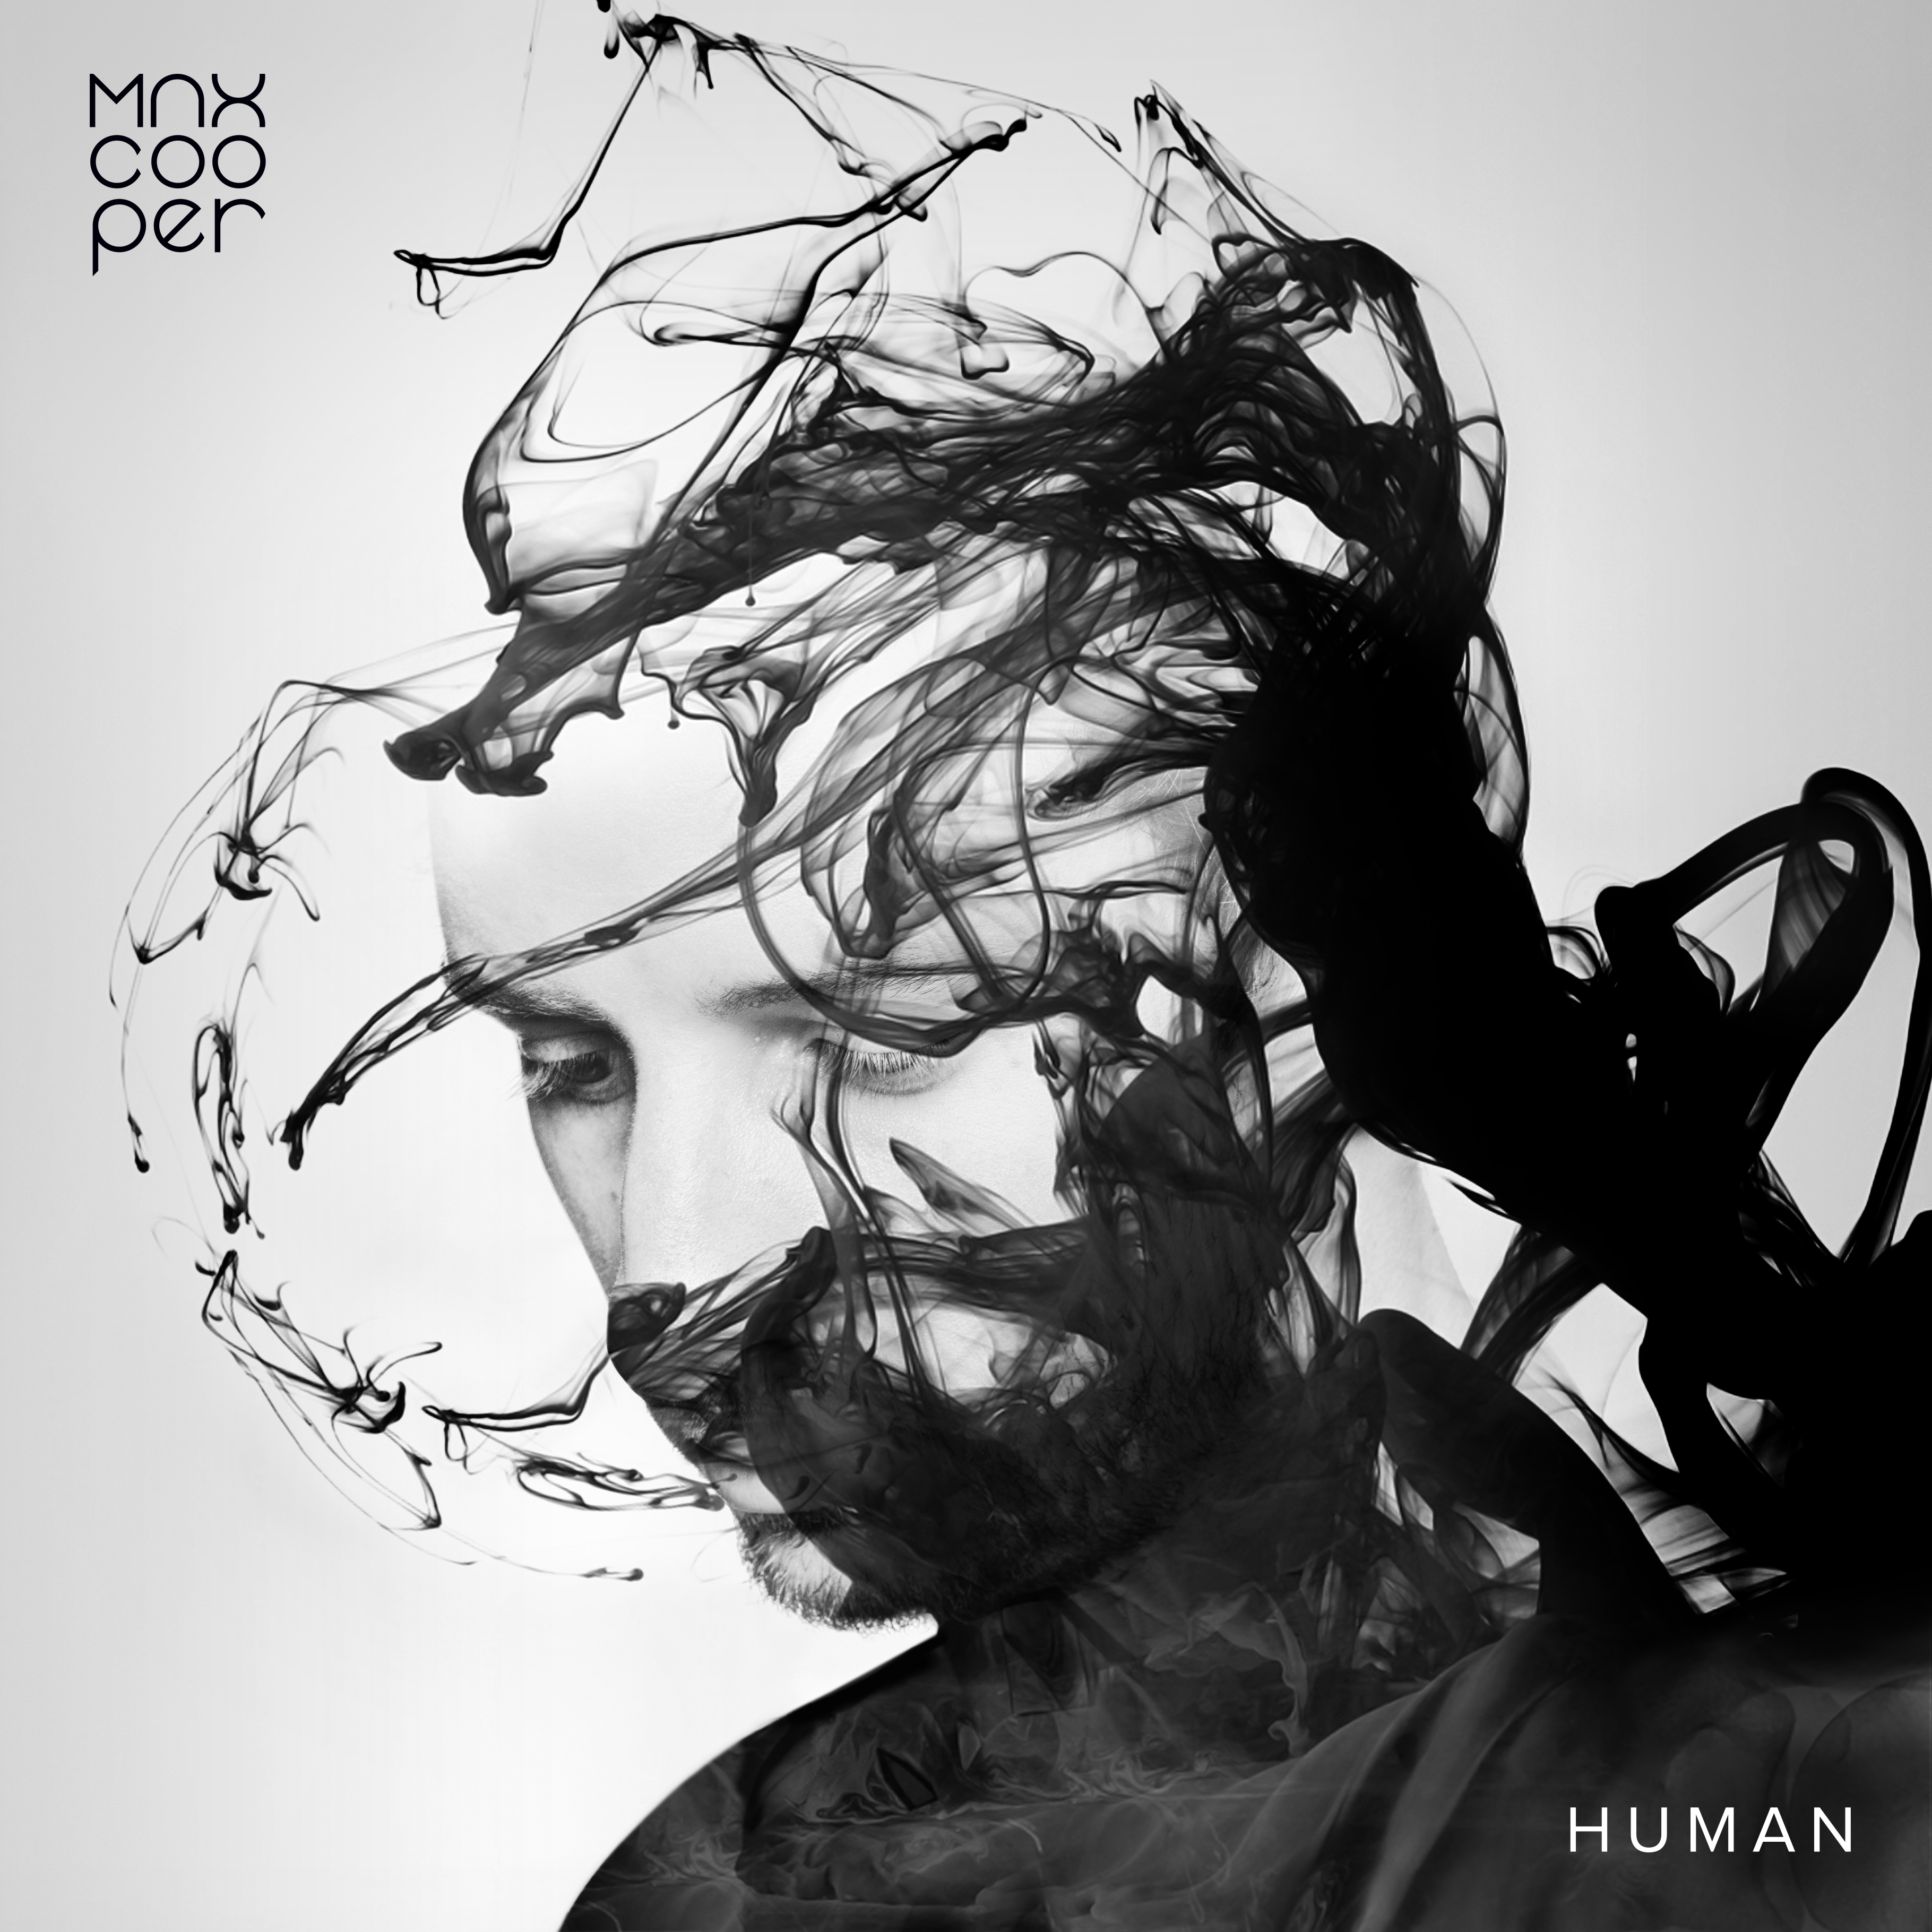 Max Cooper - Human [CD] - Mesh